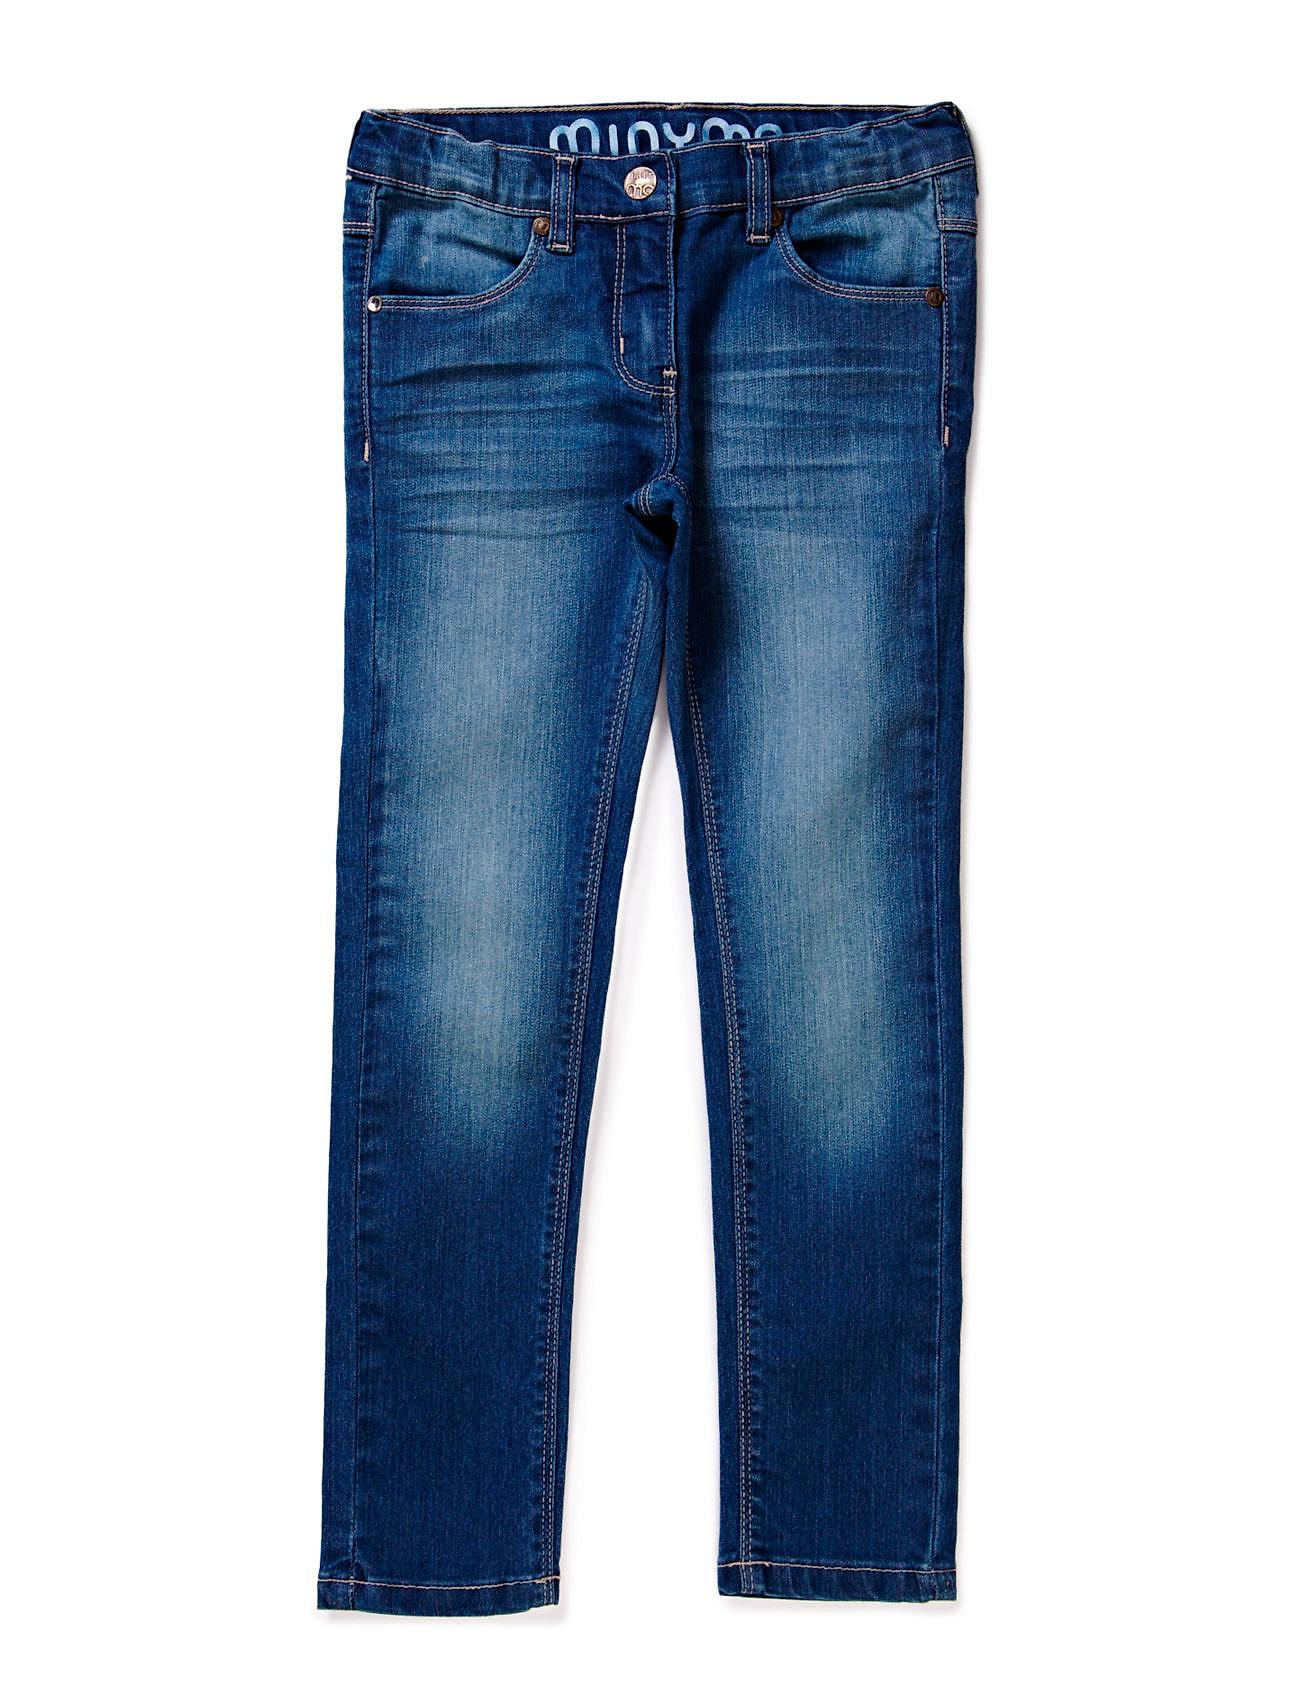 Minymo Jeans girl - Tight fit - DENIM